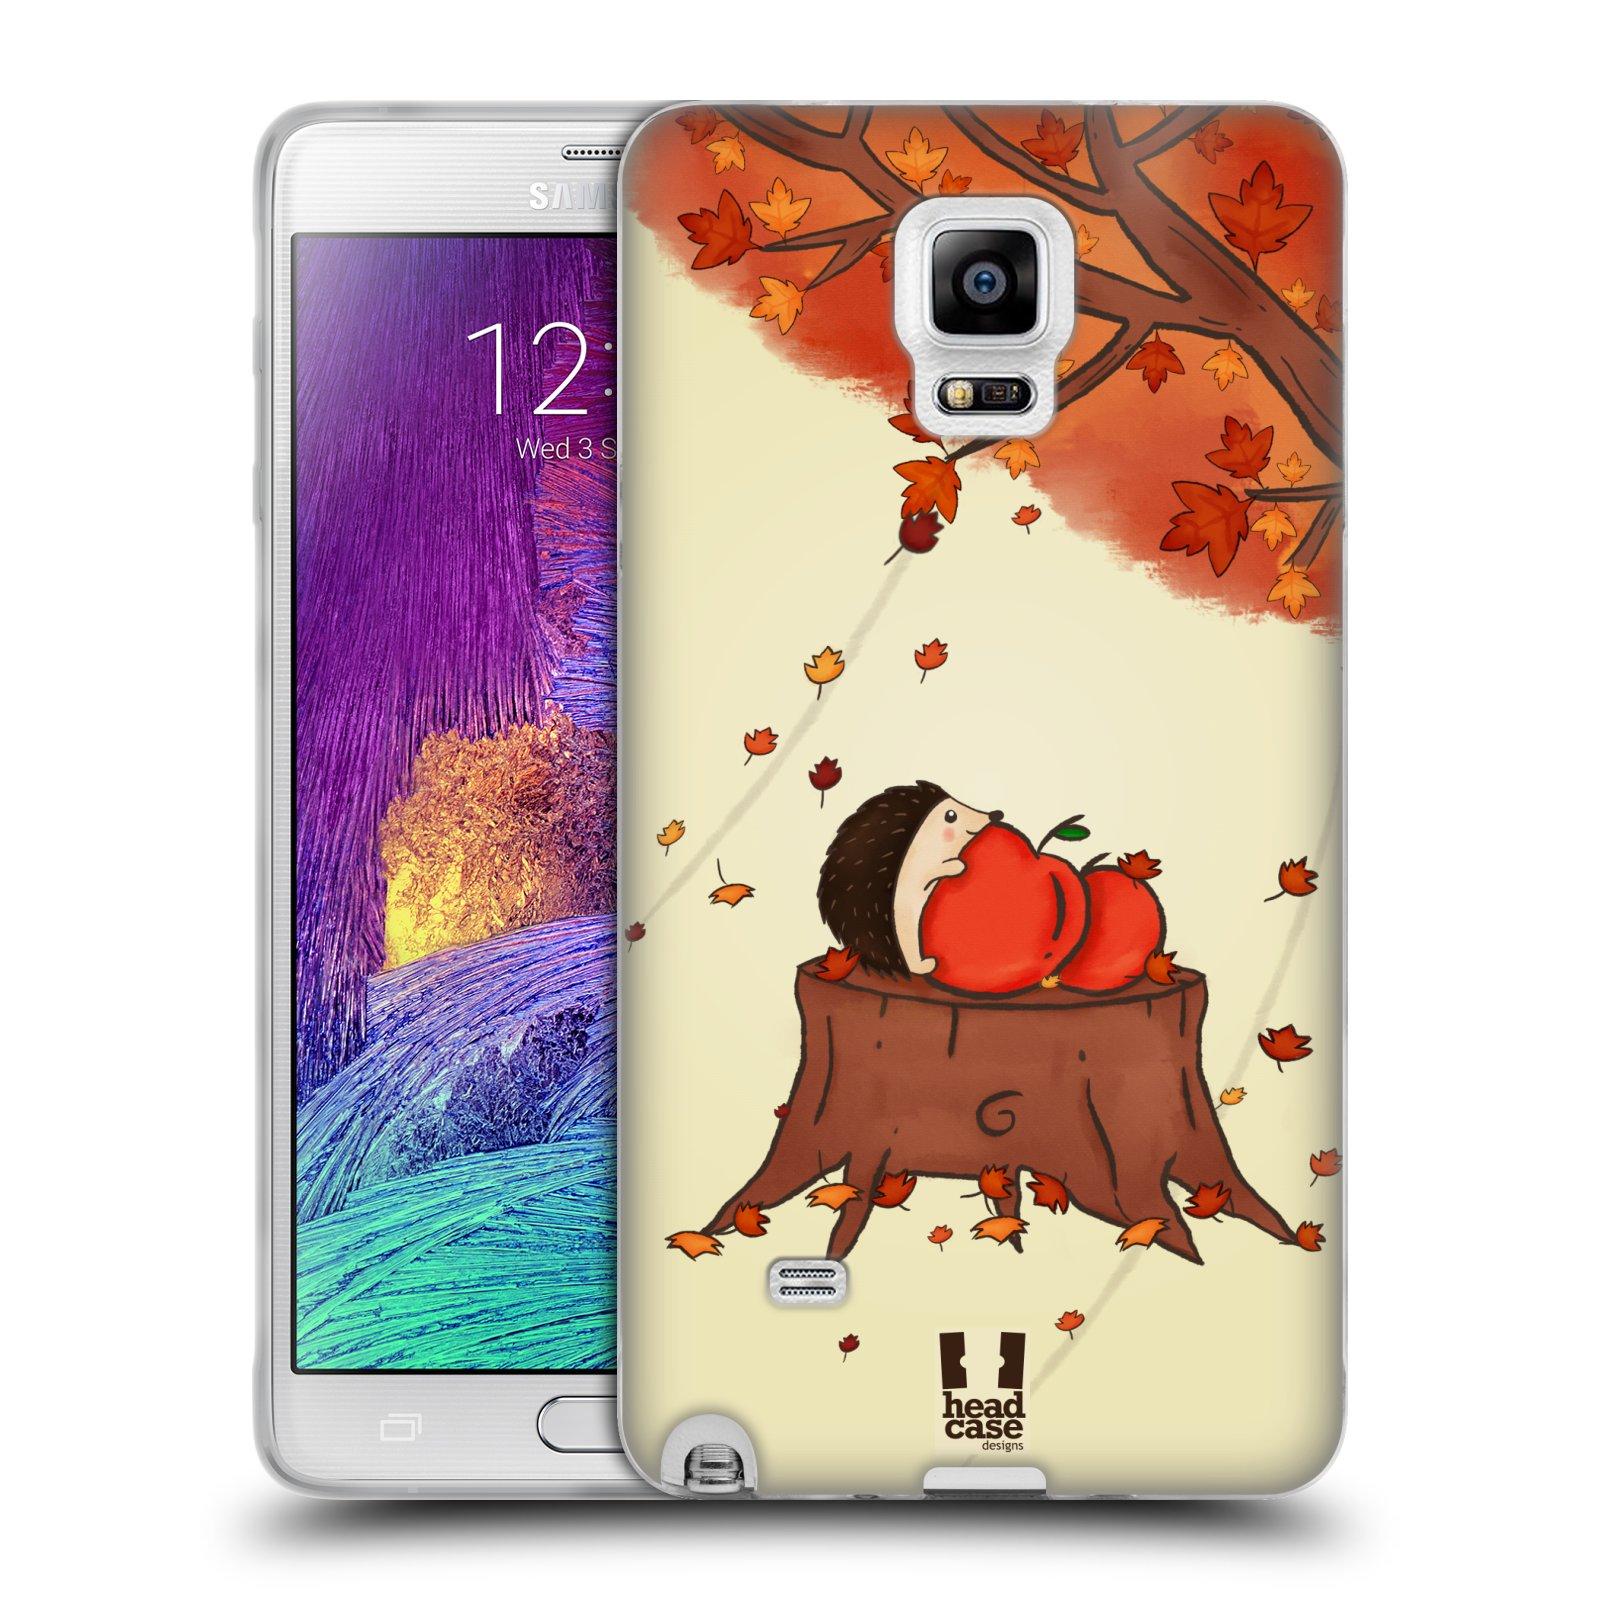 HEAD CASE silikonový obal na mobil Samsung Galaxy Note 4 (N910) vzor podzimní zvířátka ježek a jablíčka